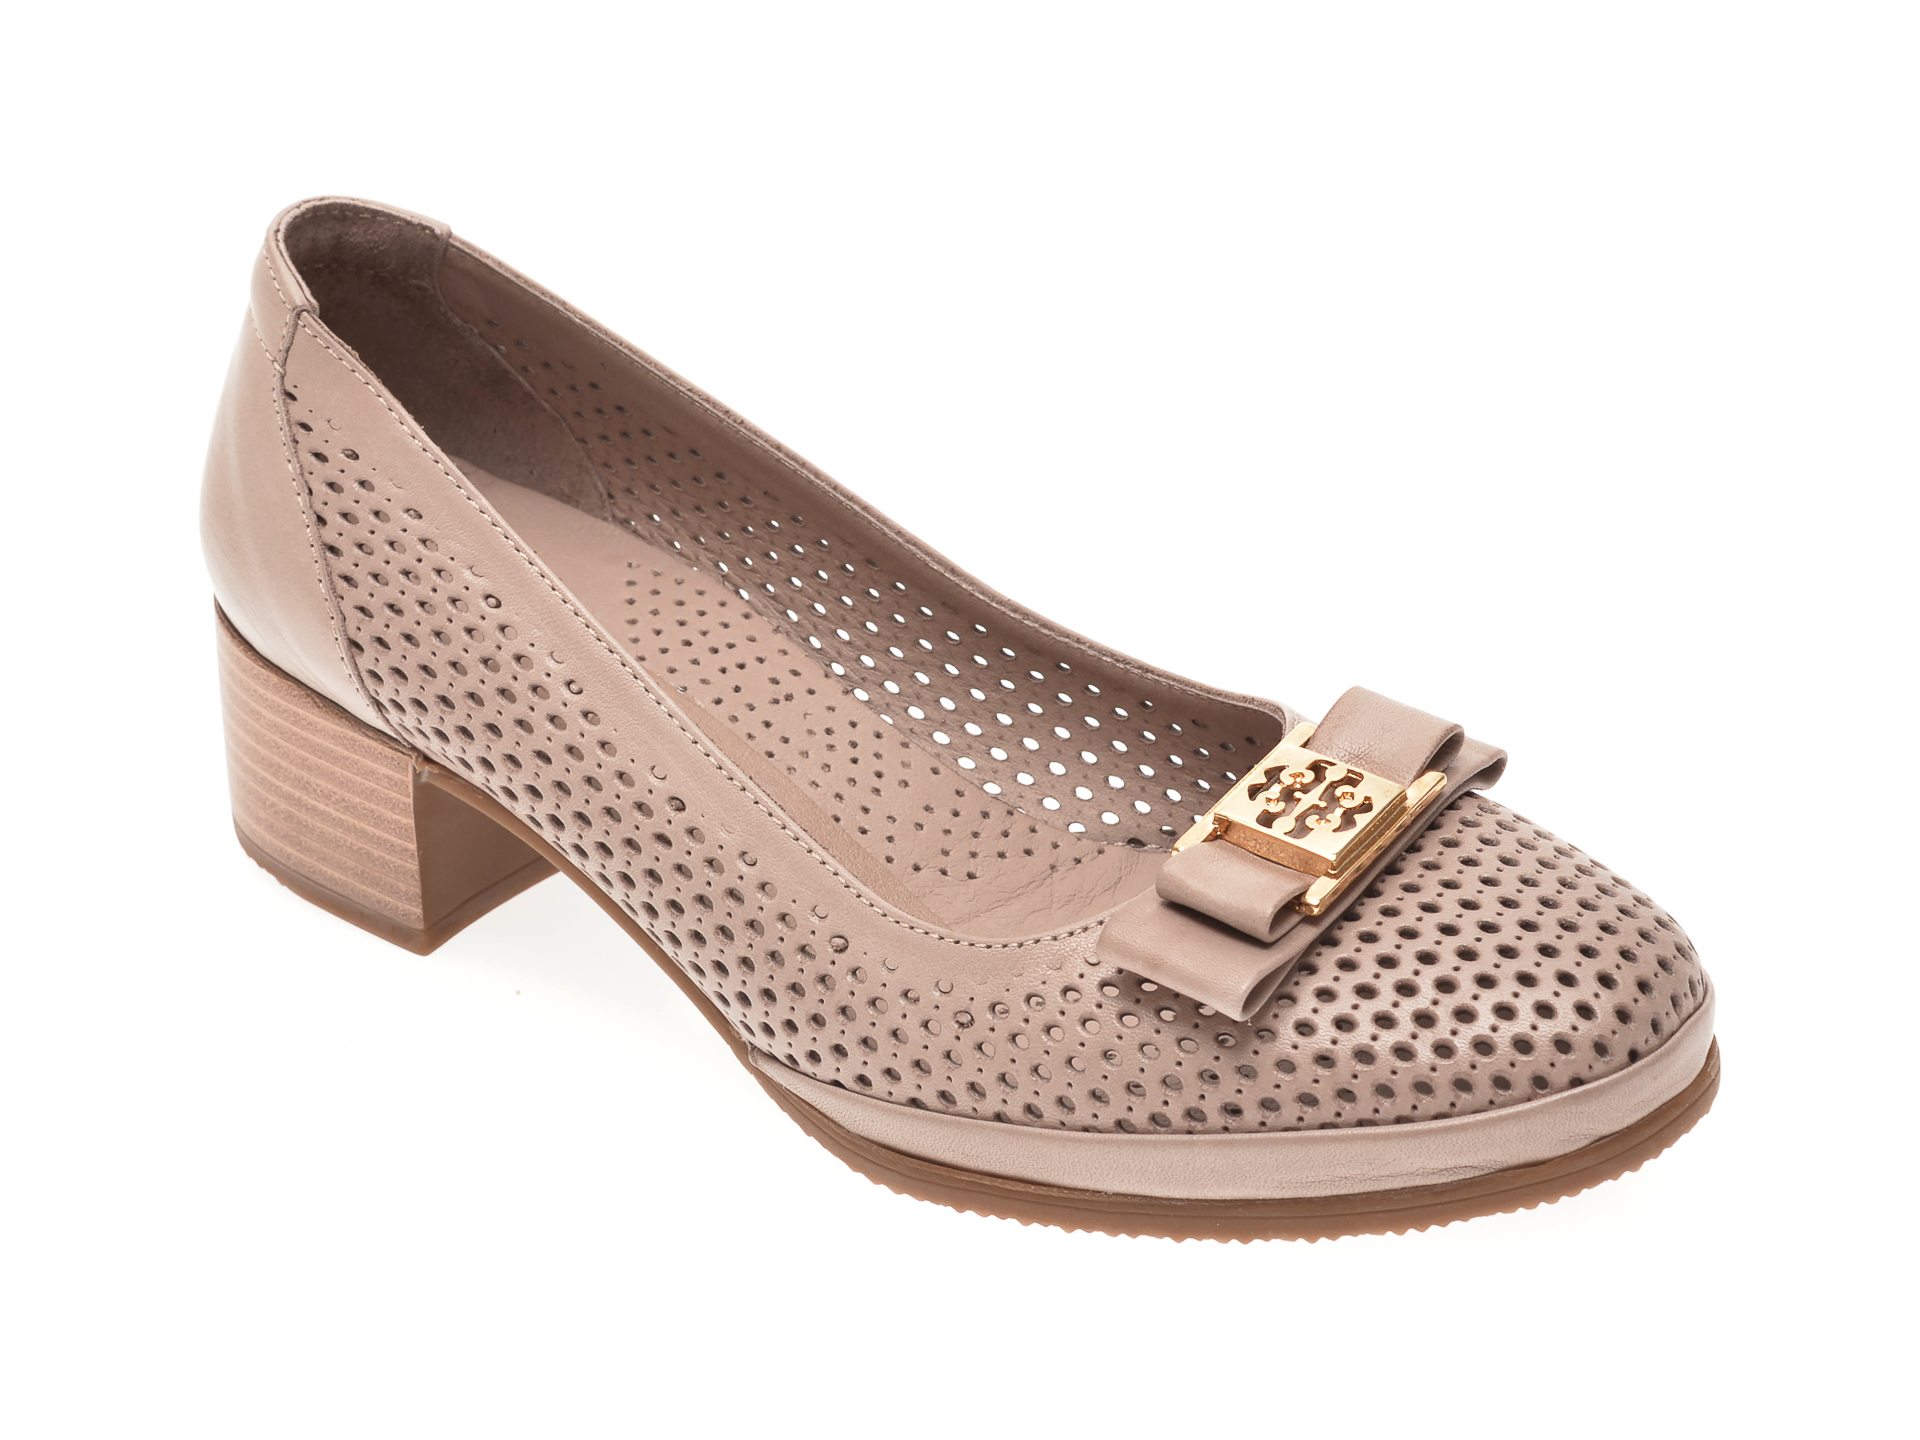 Pantofi FLAVIA PASSINI gri, 0105081, din piele naturala imagine